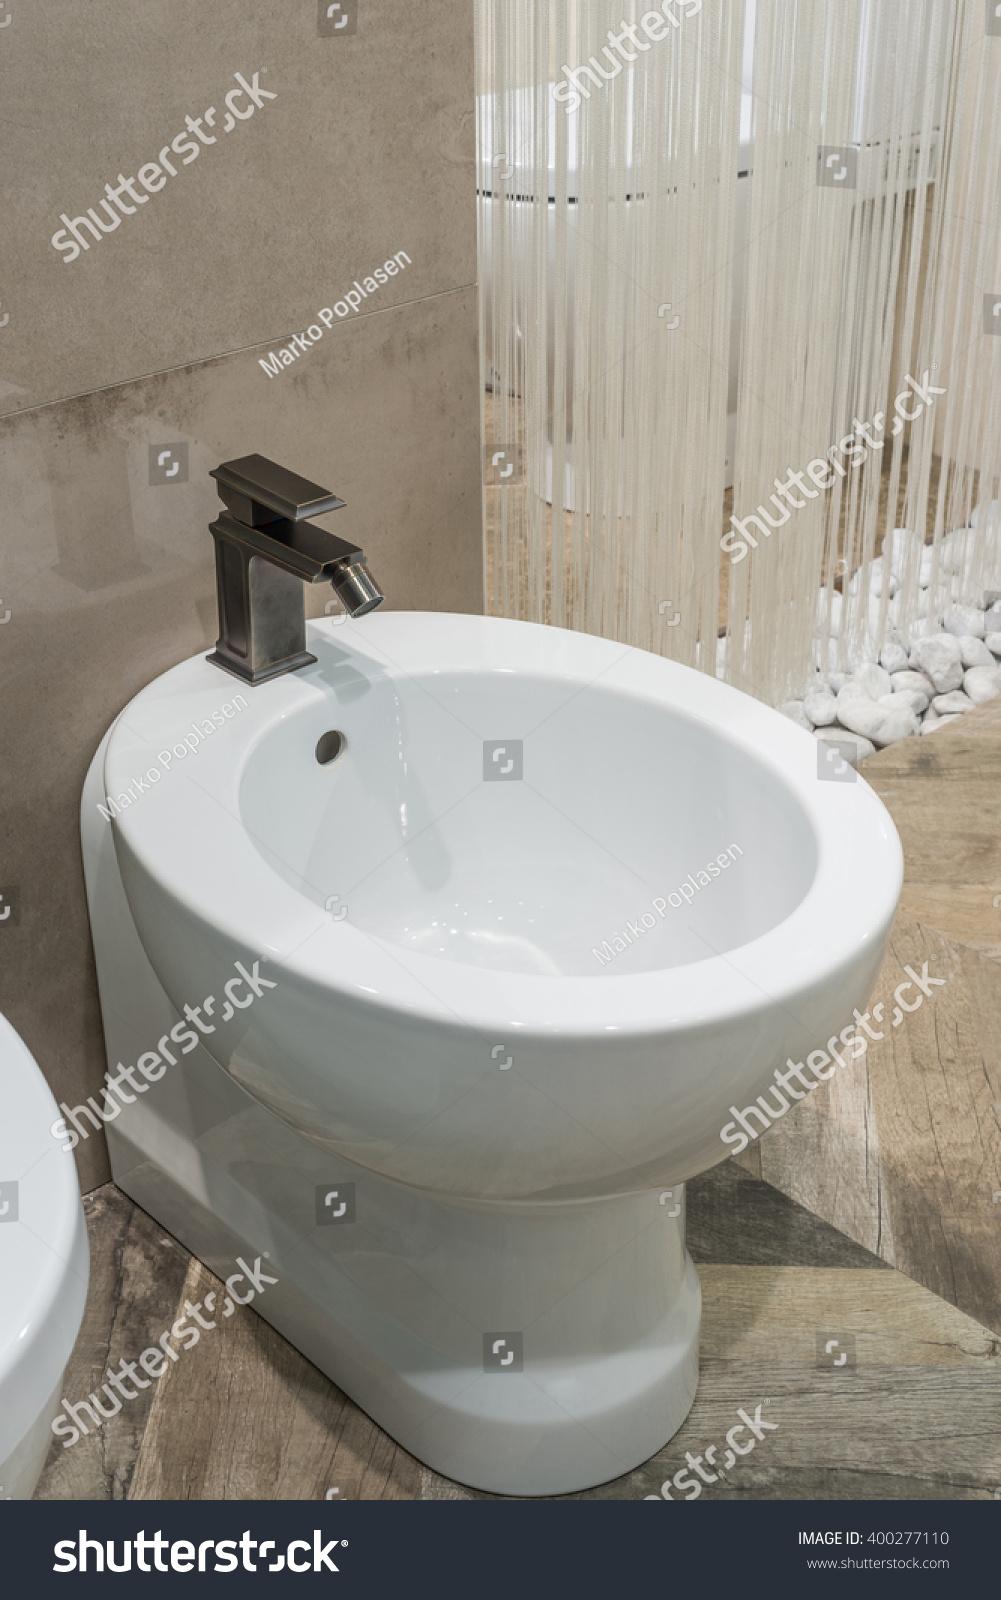 Luxury Bathroom Closeup Watercloset Bidet Stock Photo Edit Now